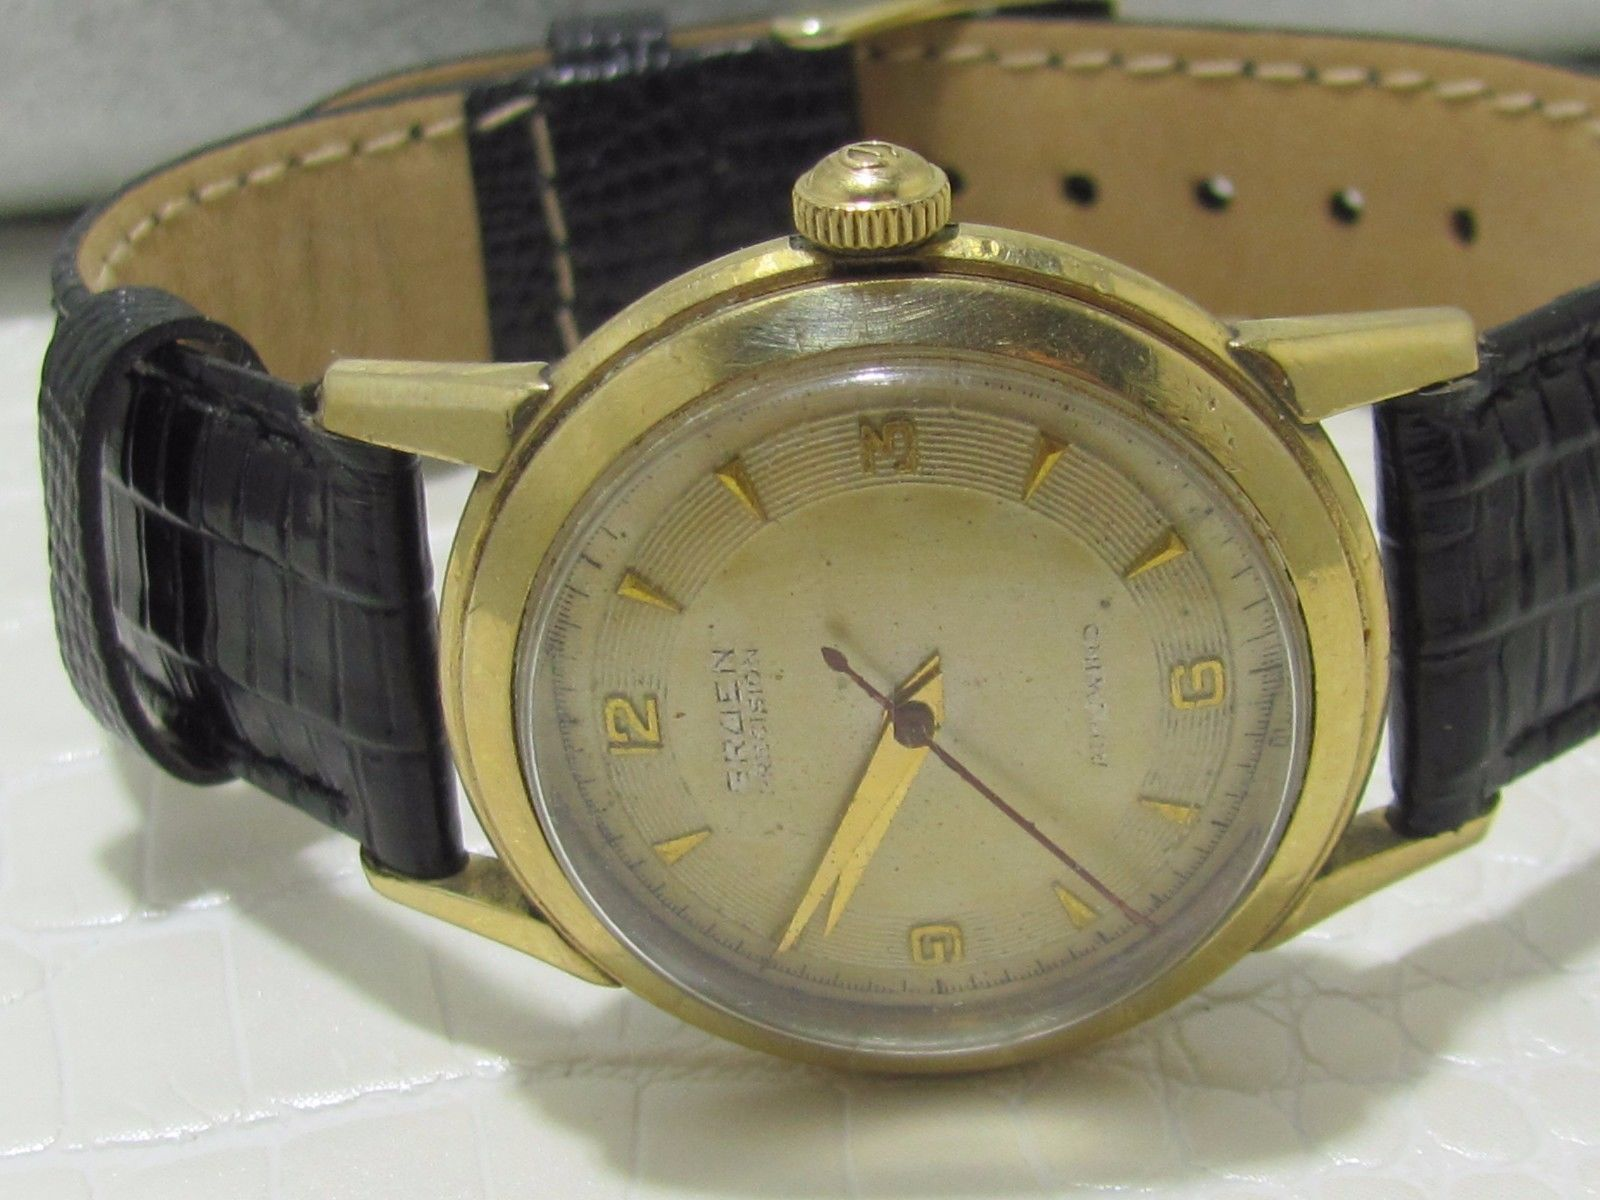 gruen automatic precision vintage watch swiss 460ss 17. Black Bedroom Furniture Sets. Home Design Ideas